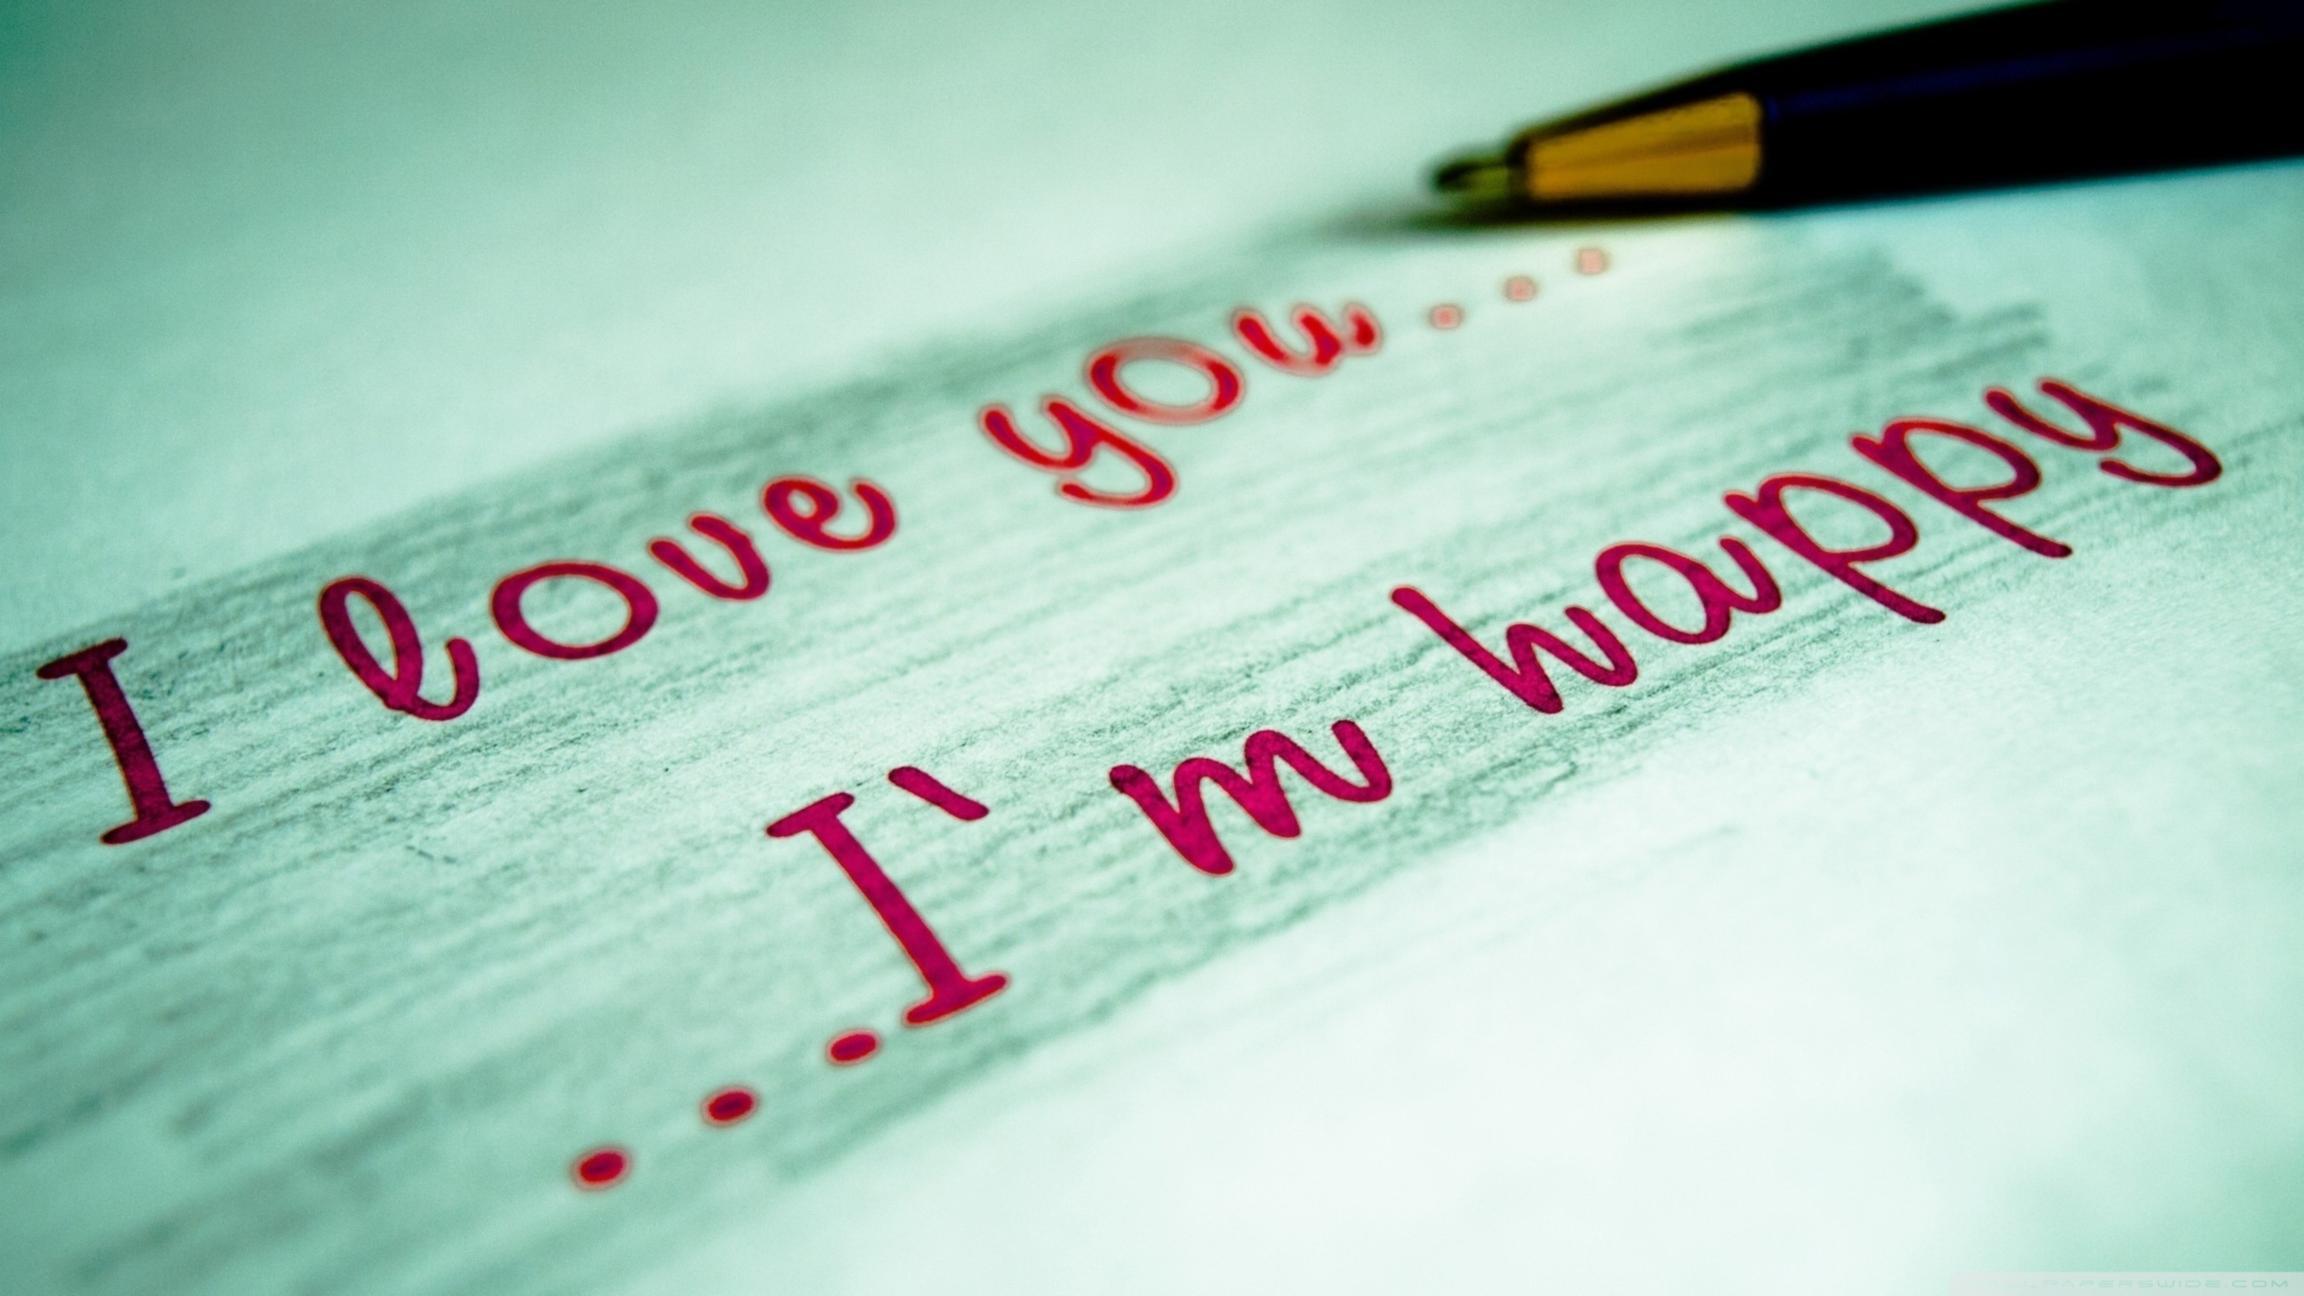 Best romantic love messages for him her romantic love messages voltagebd Choice Image